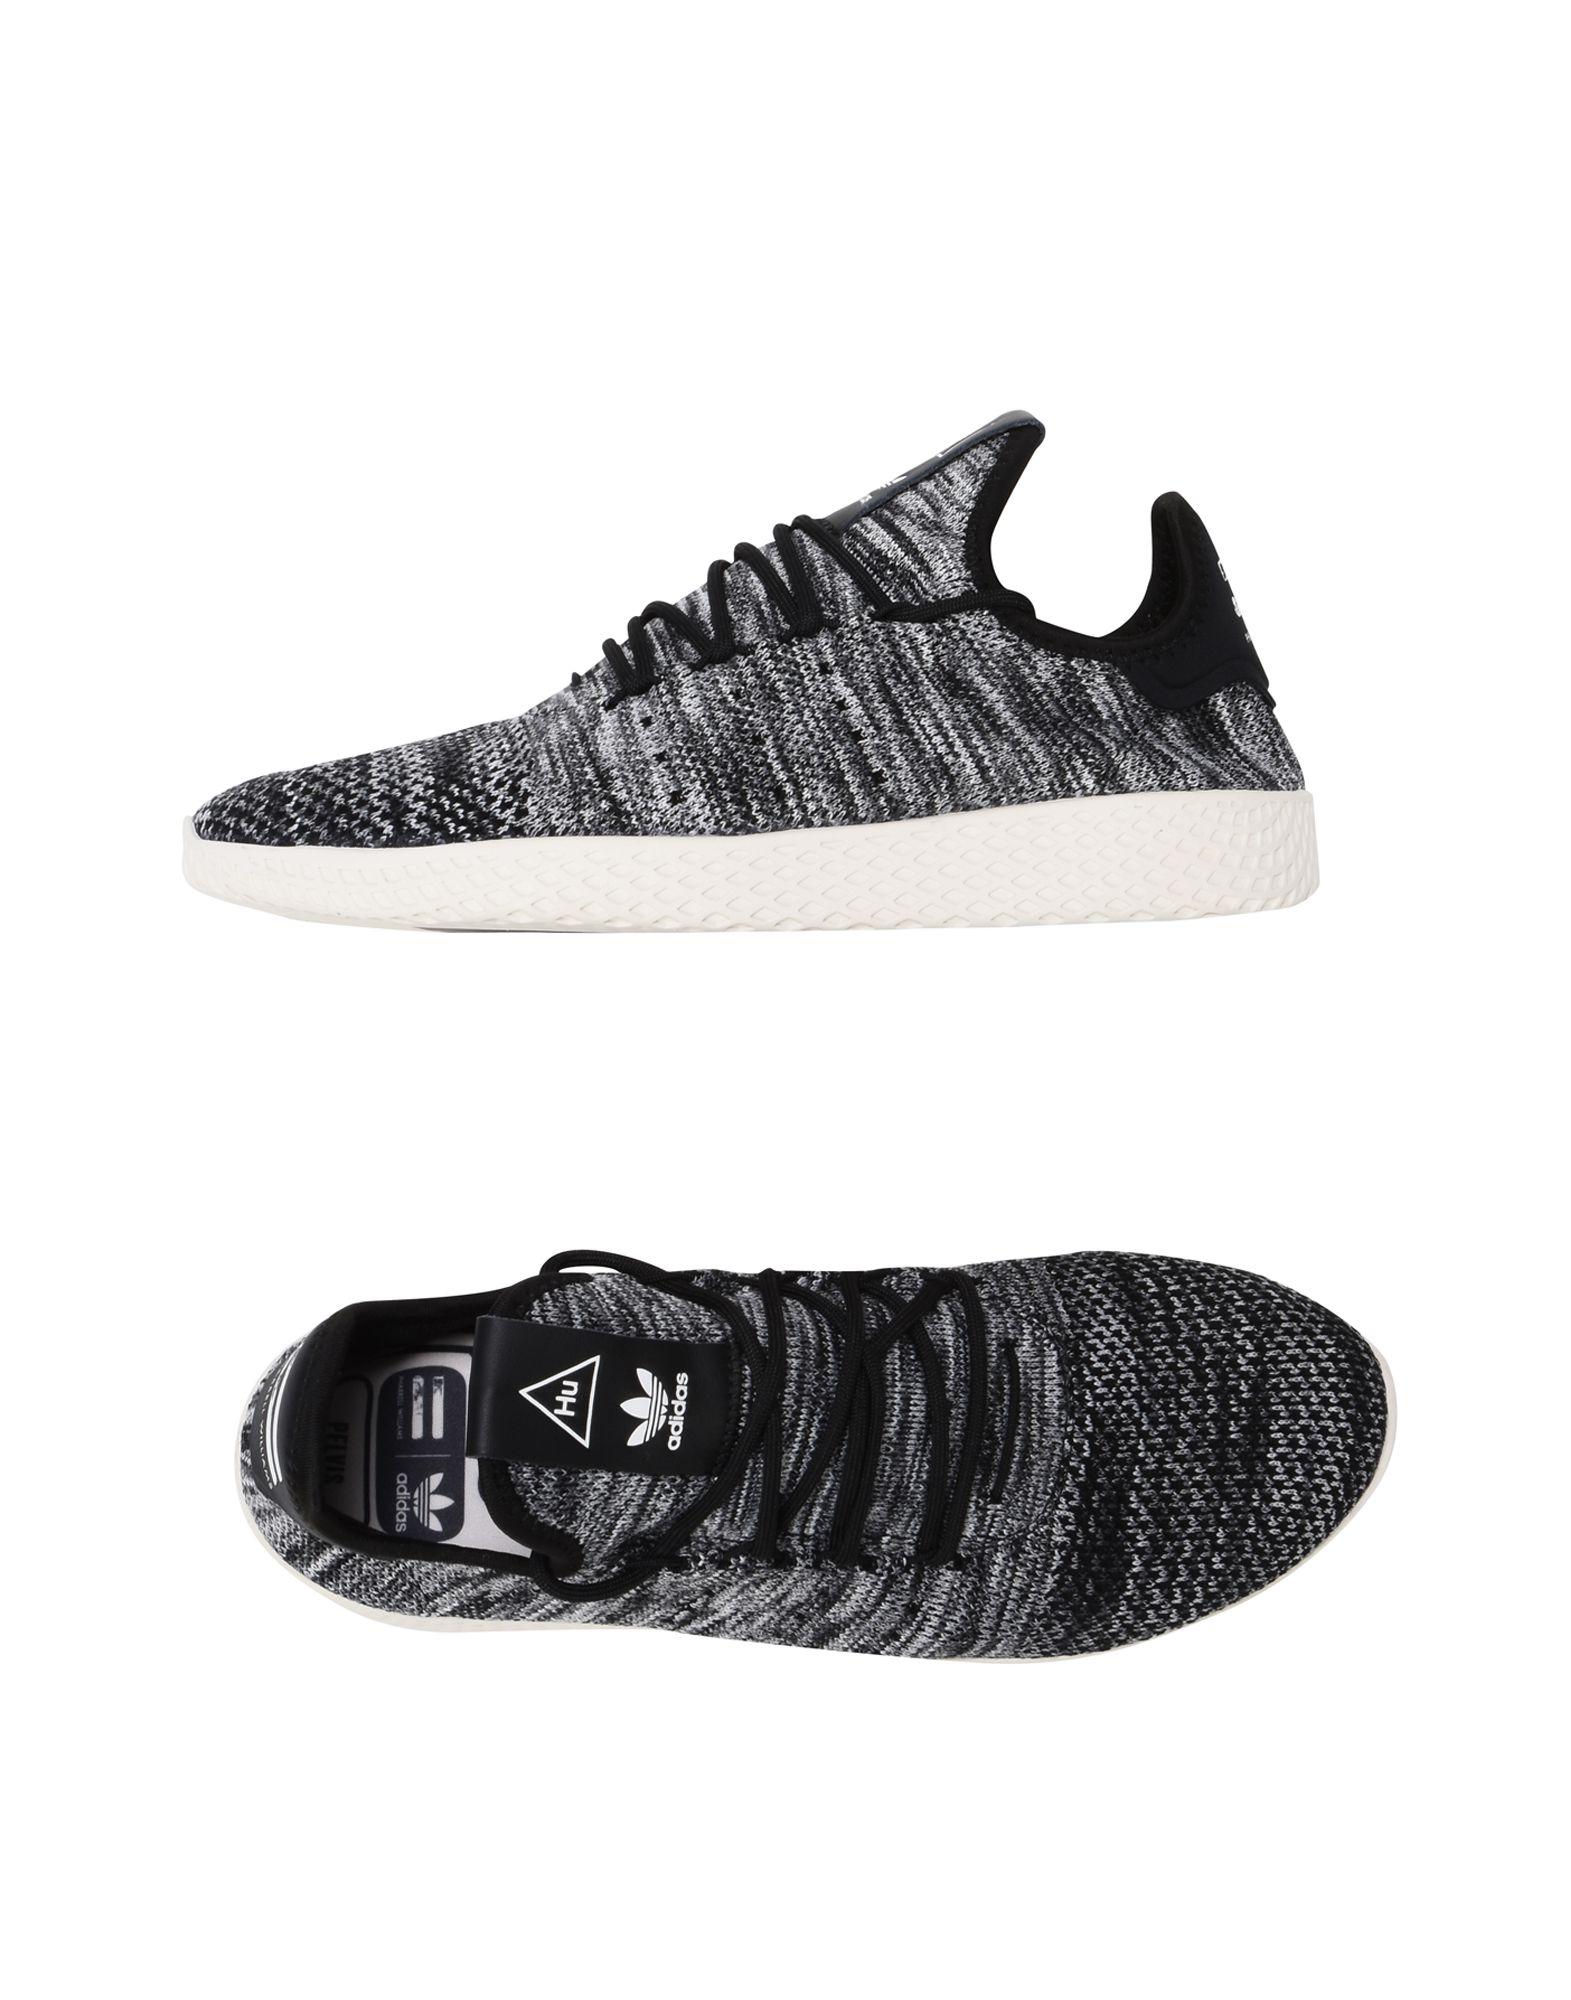 Sneakers Adidas Originals By Pharrell Williams Pw Tennis Hu Pk - Uomo - 11458318CK